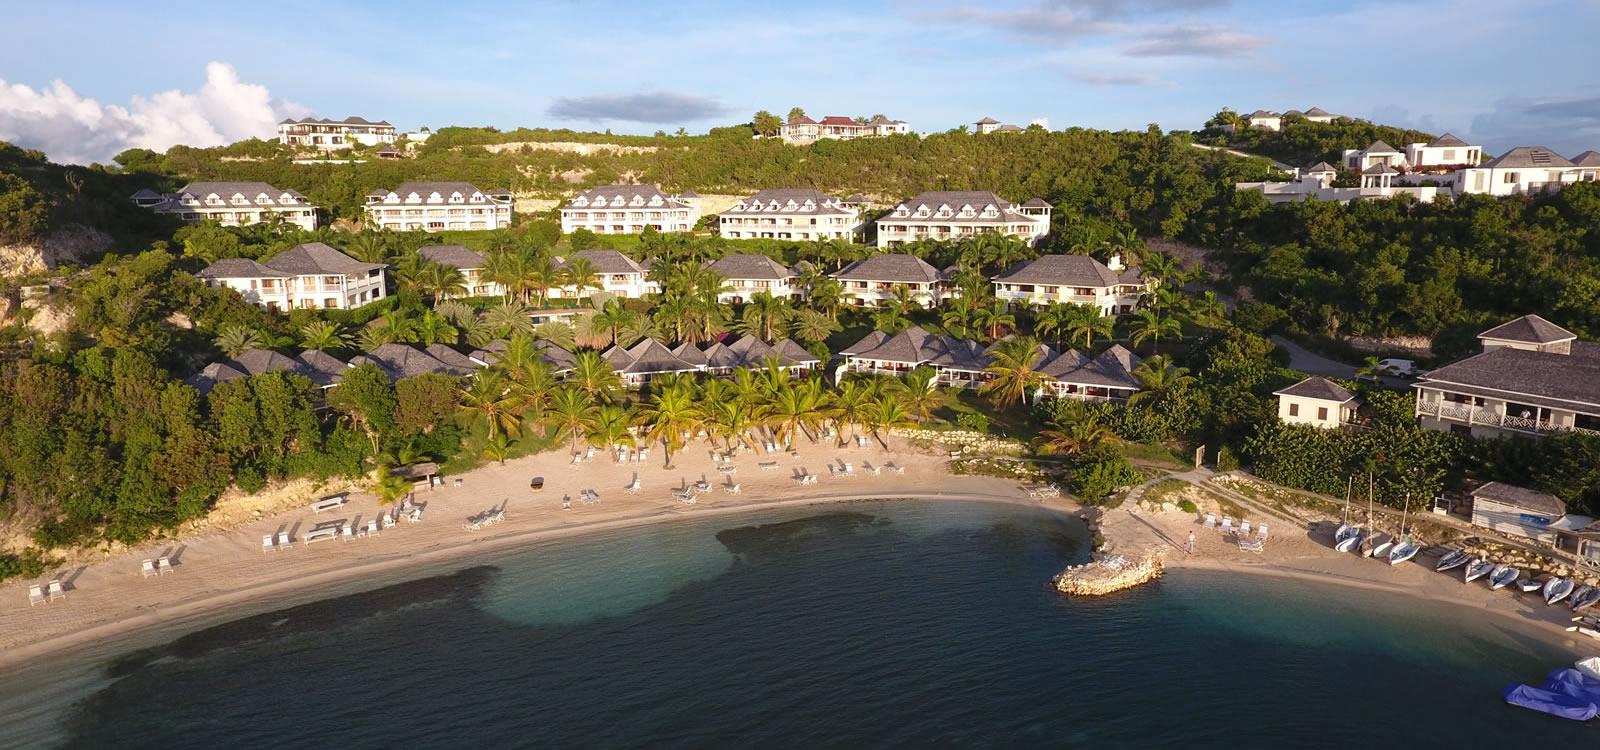 2 Bedroom Condos for Sale, Nonsuch Bay, Antigua - 7th Heaven Properties